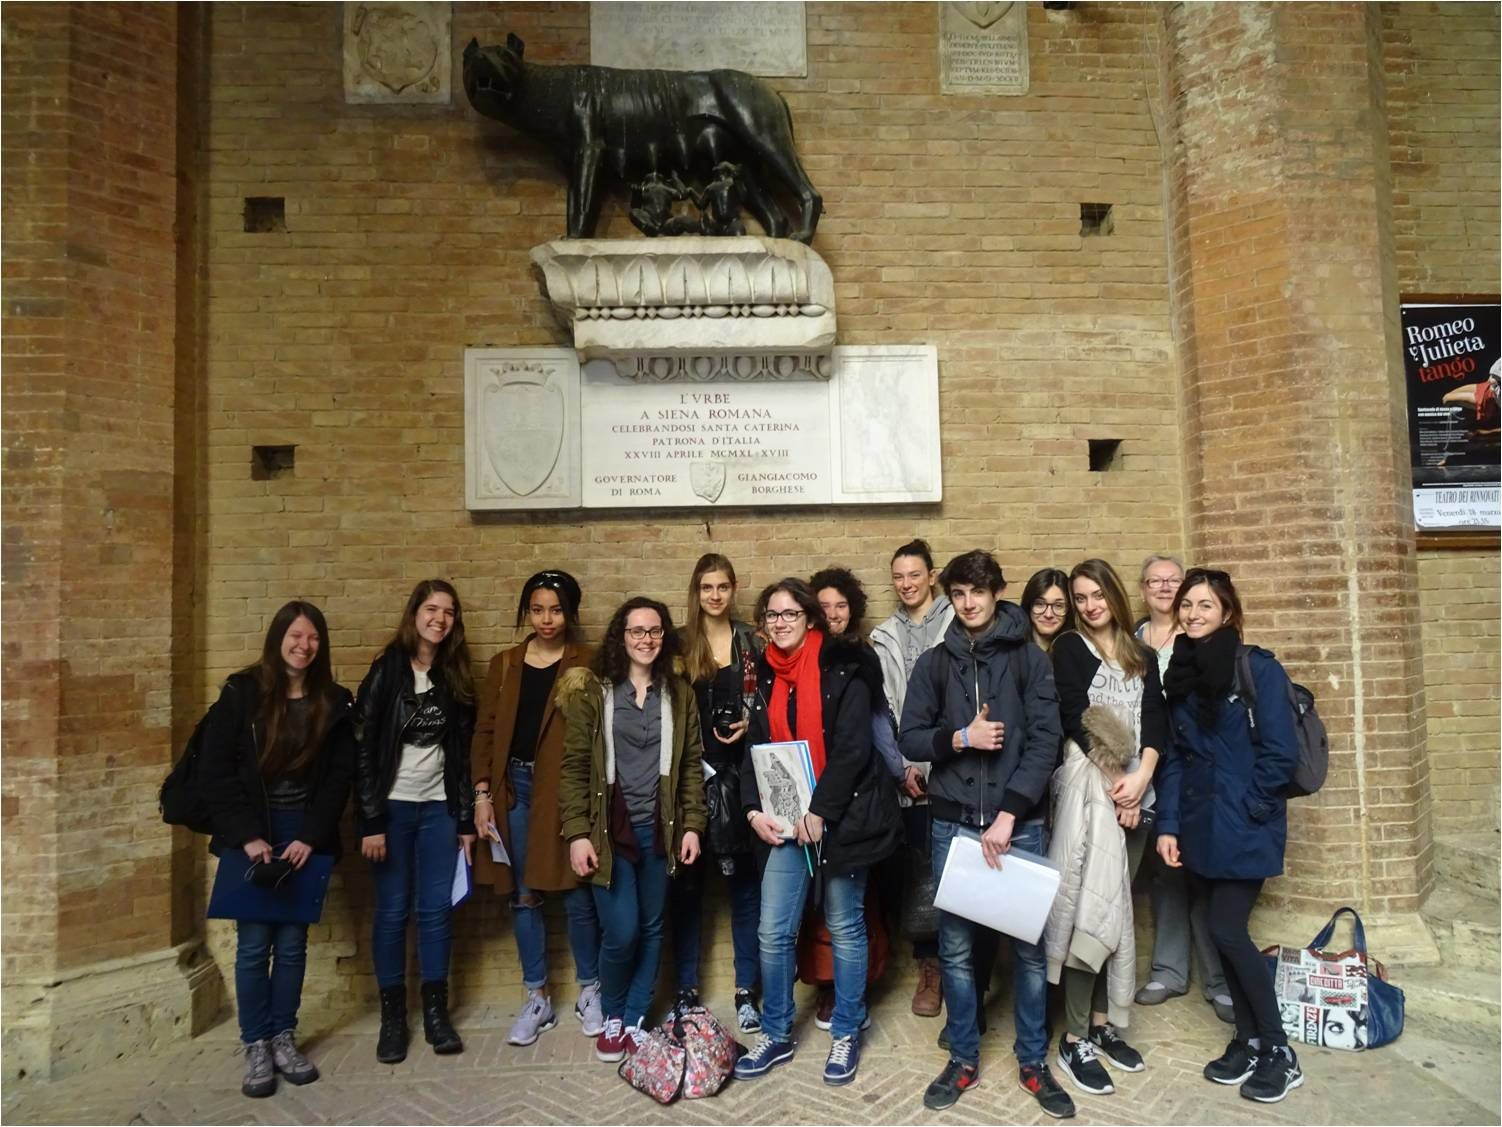 Sienne, Palazzo Pubblico, 18-03-16 : les latinistes à l'oeuvre !